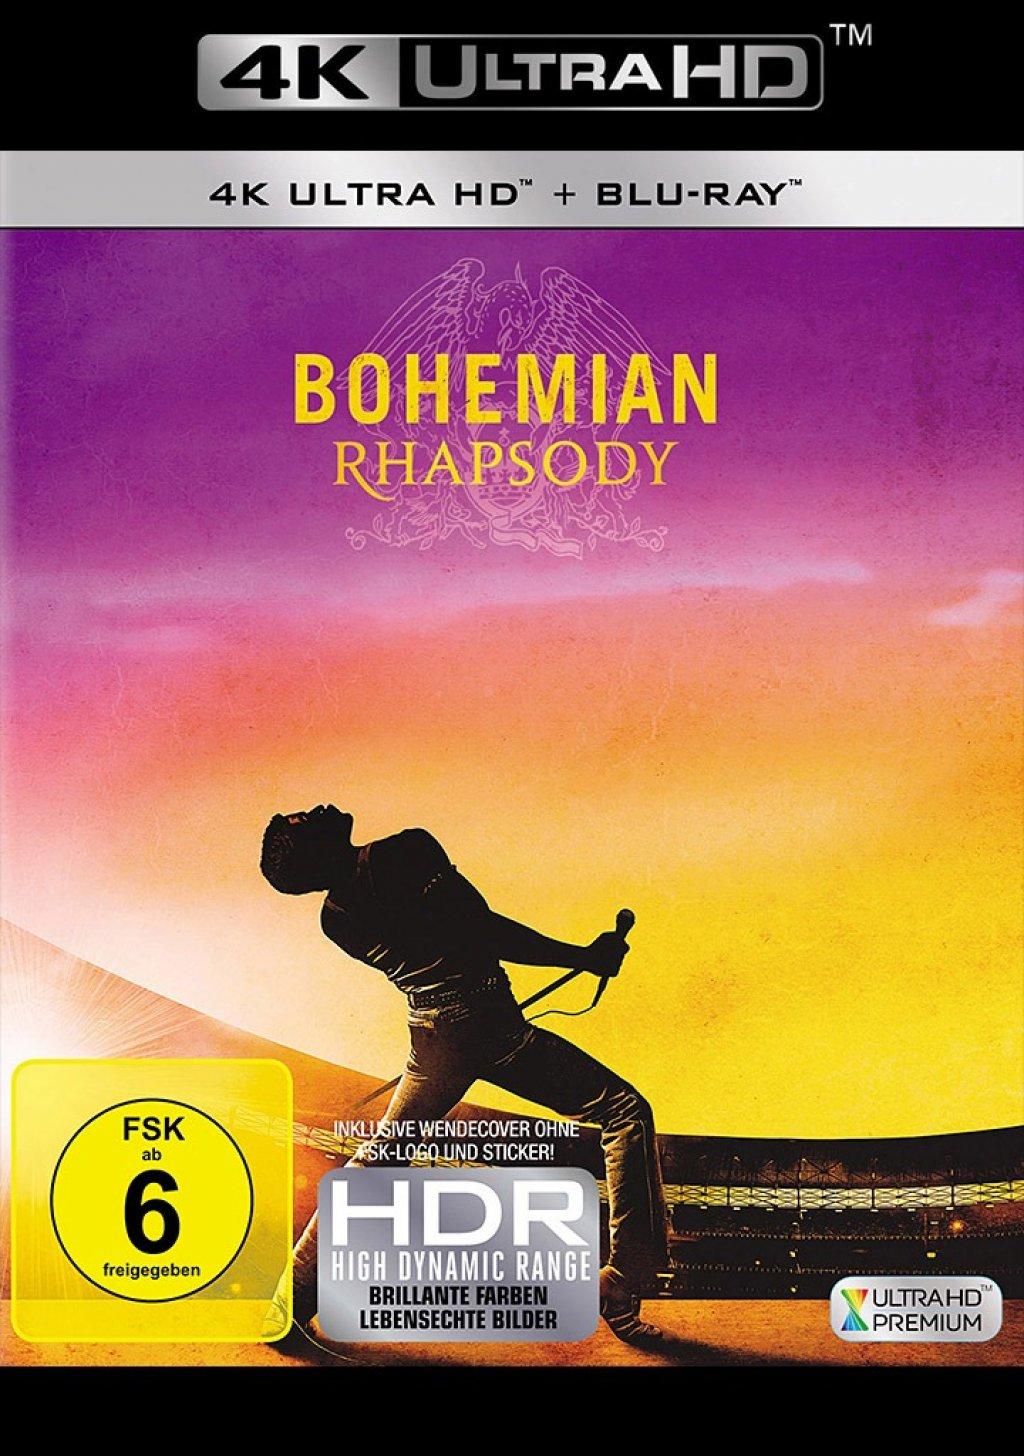 Bohemian Rhapsody - 4K Ultra HD Blu-ray + Blu-ray (4K Ultra HD)